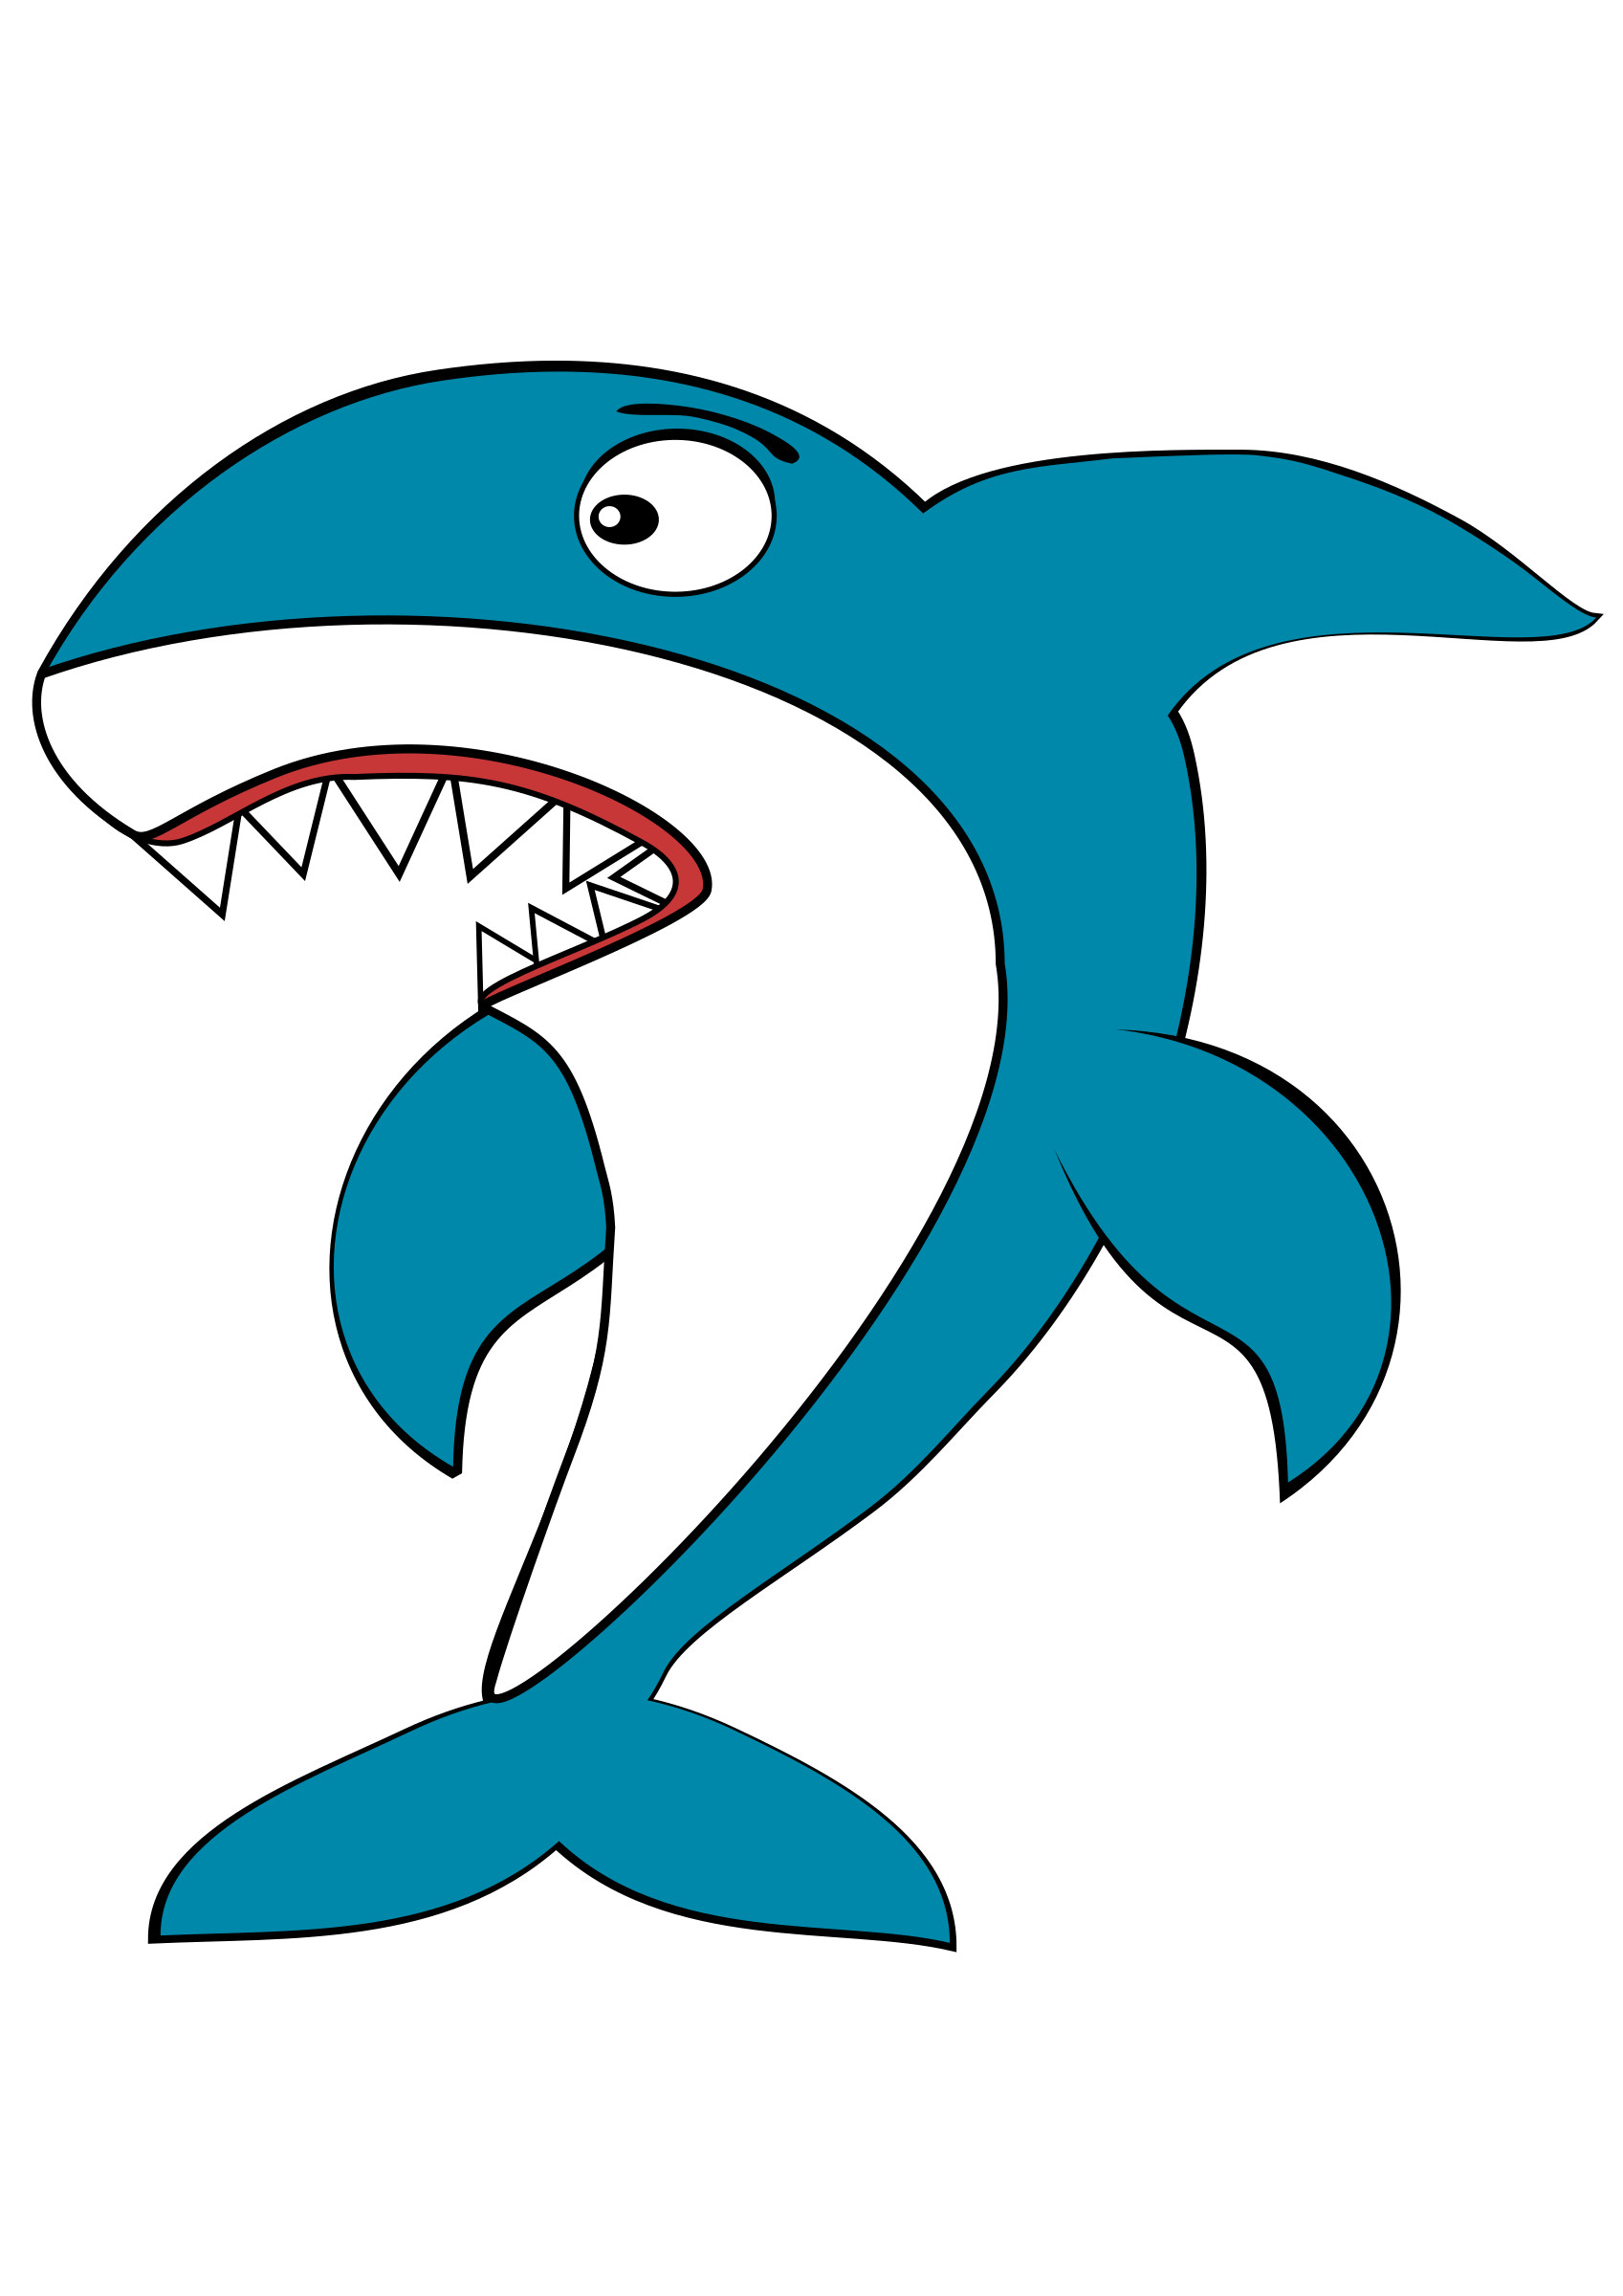 Shark cartoon big image. Dolphin clipart comic